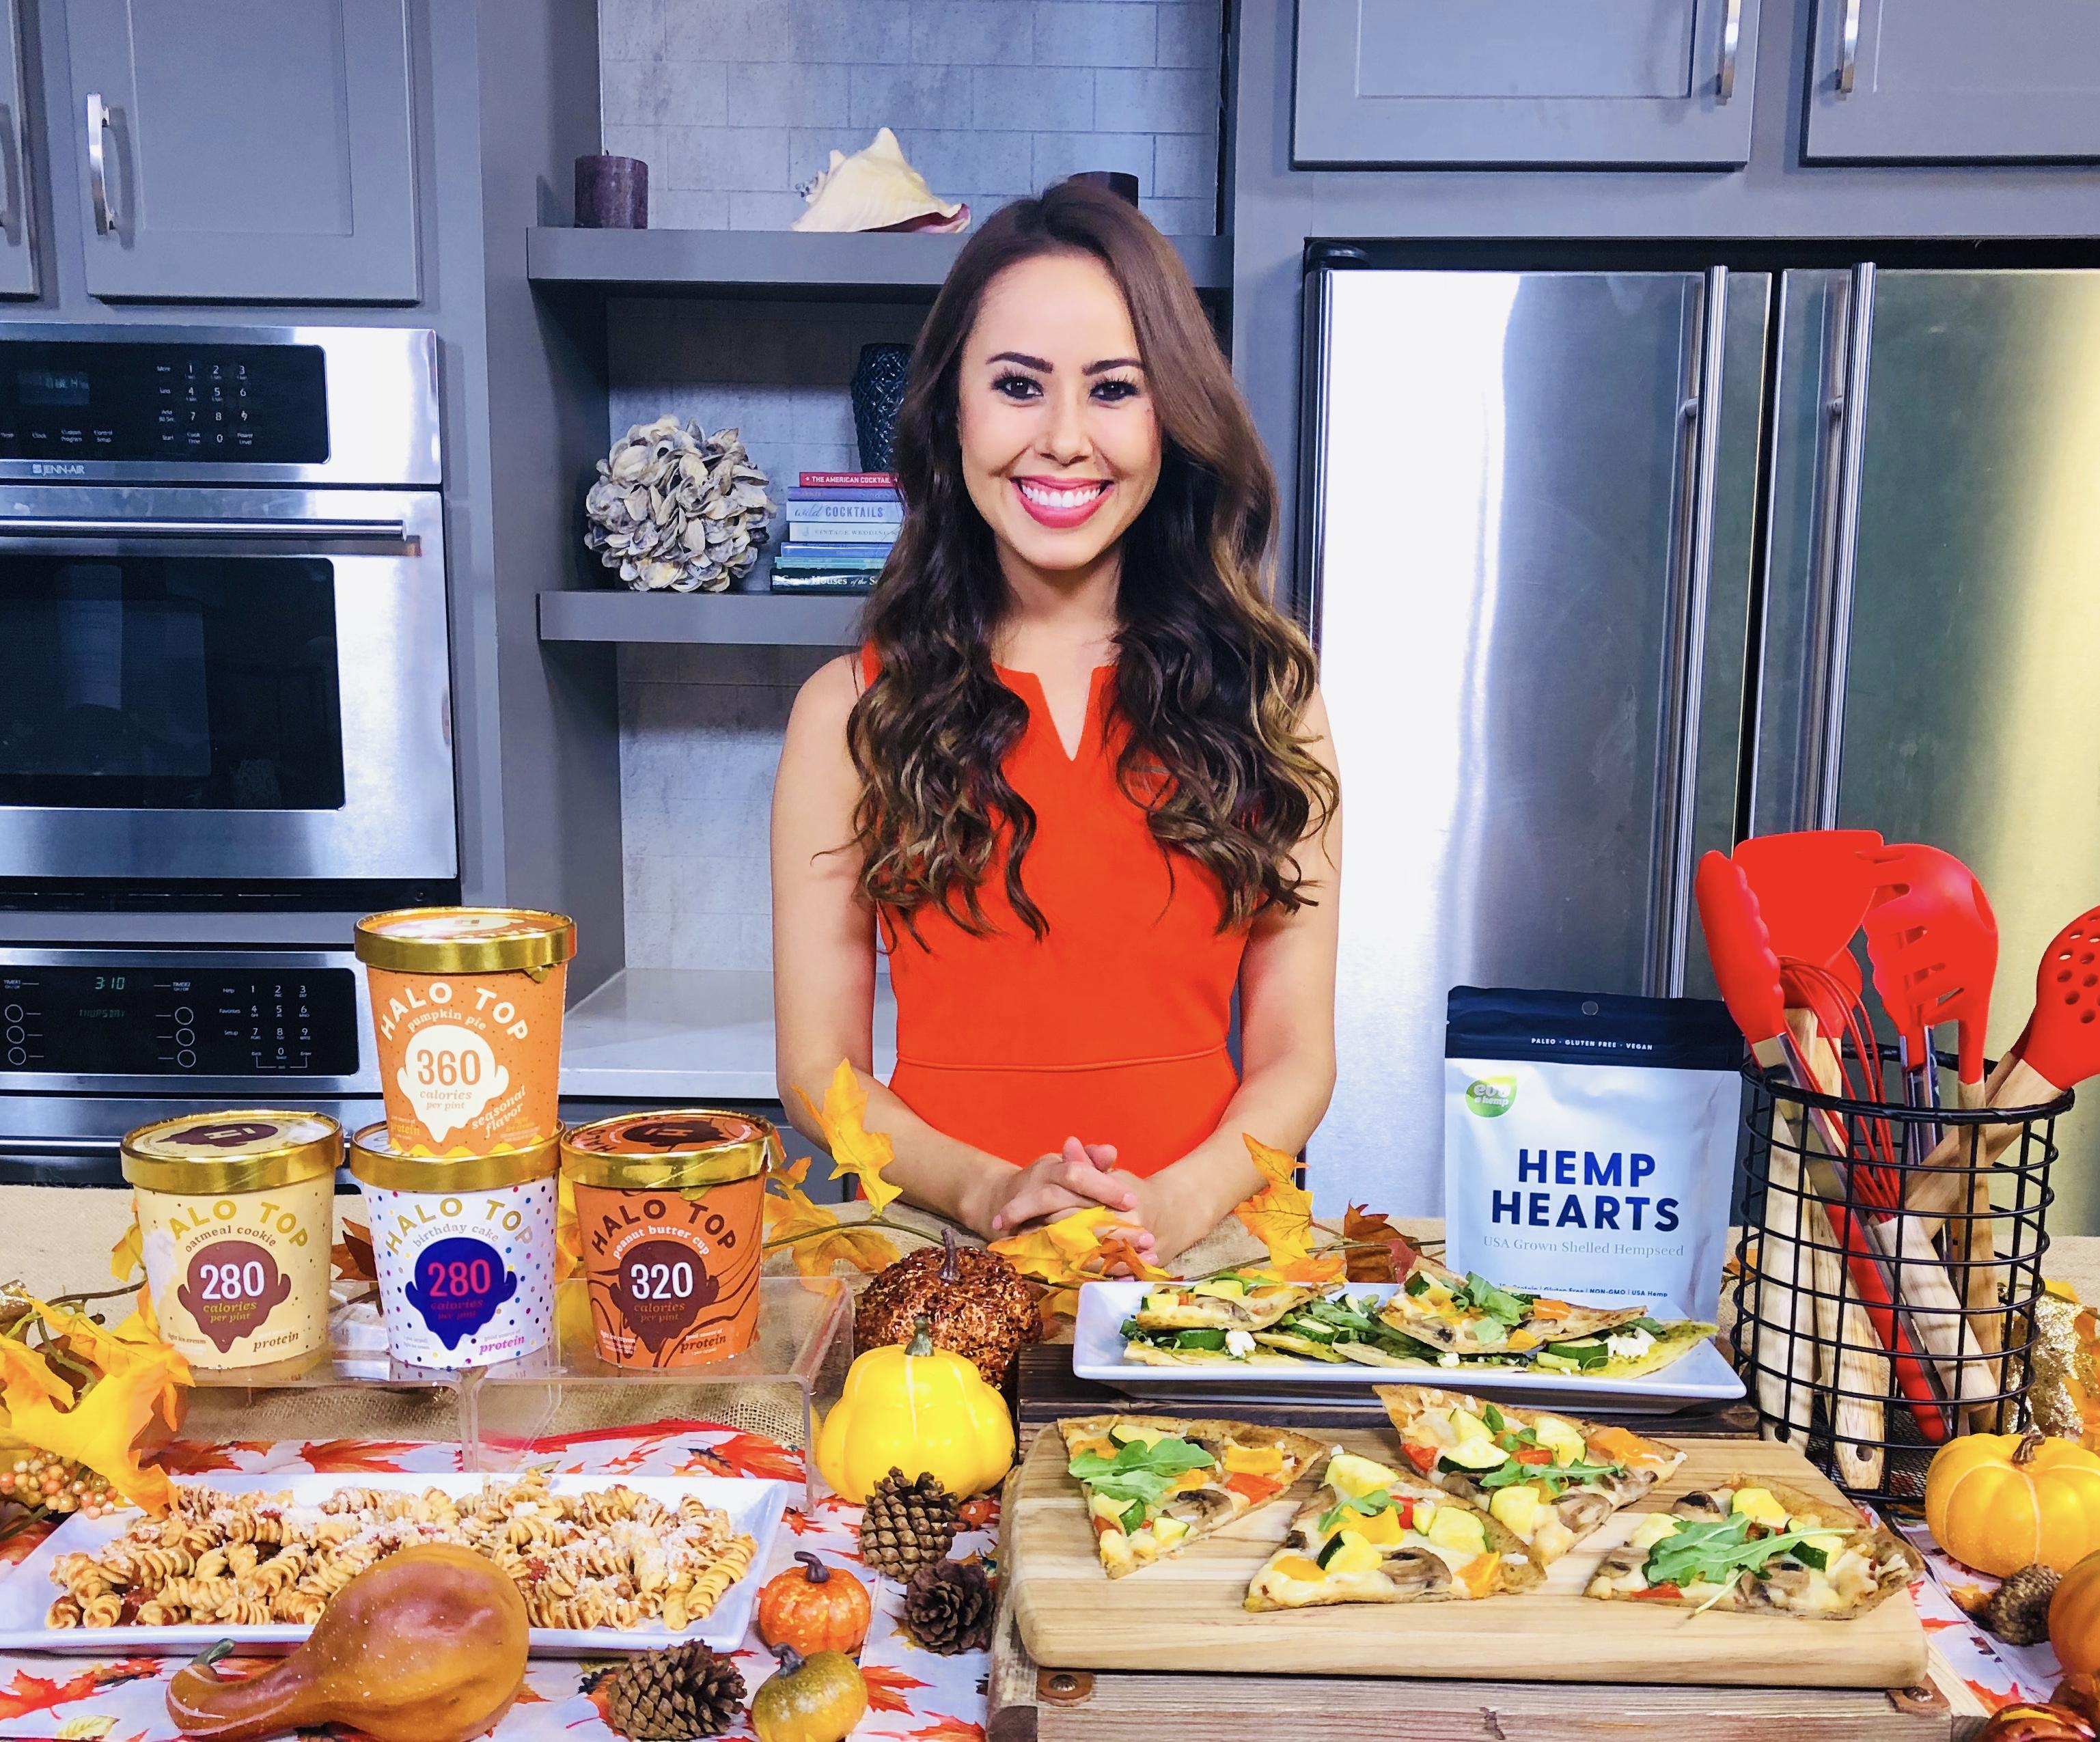 Halo Top, CAULIPOWER cauliflower pizza crust, Bevy Luxe 7-Piece Silicone Kitchen Utensil set, Evo Hemp Mia SYn Registered Dietitian TV Media